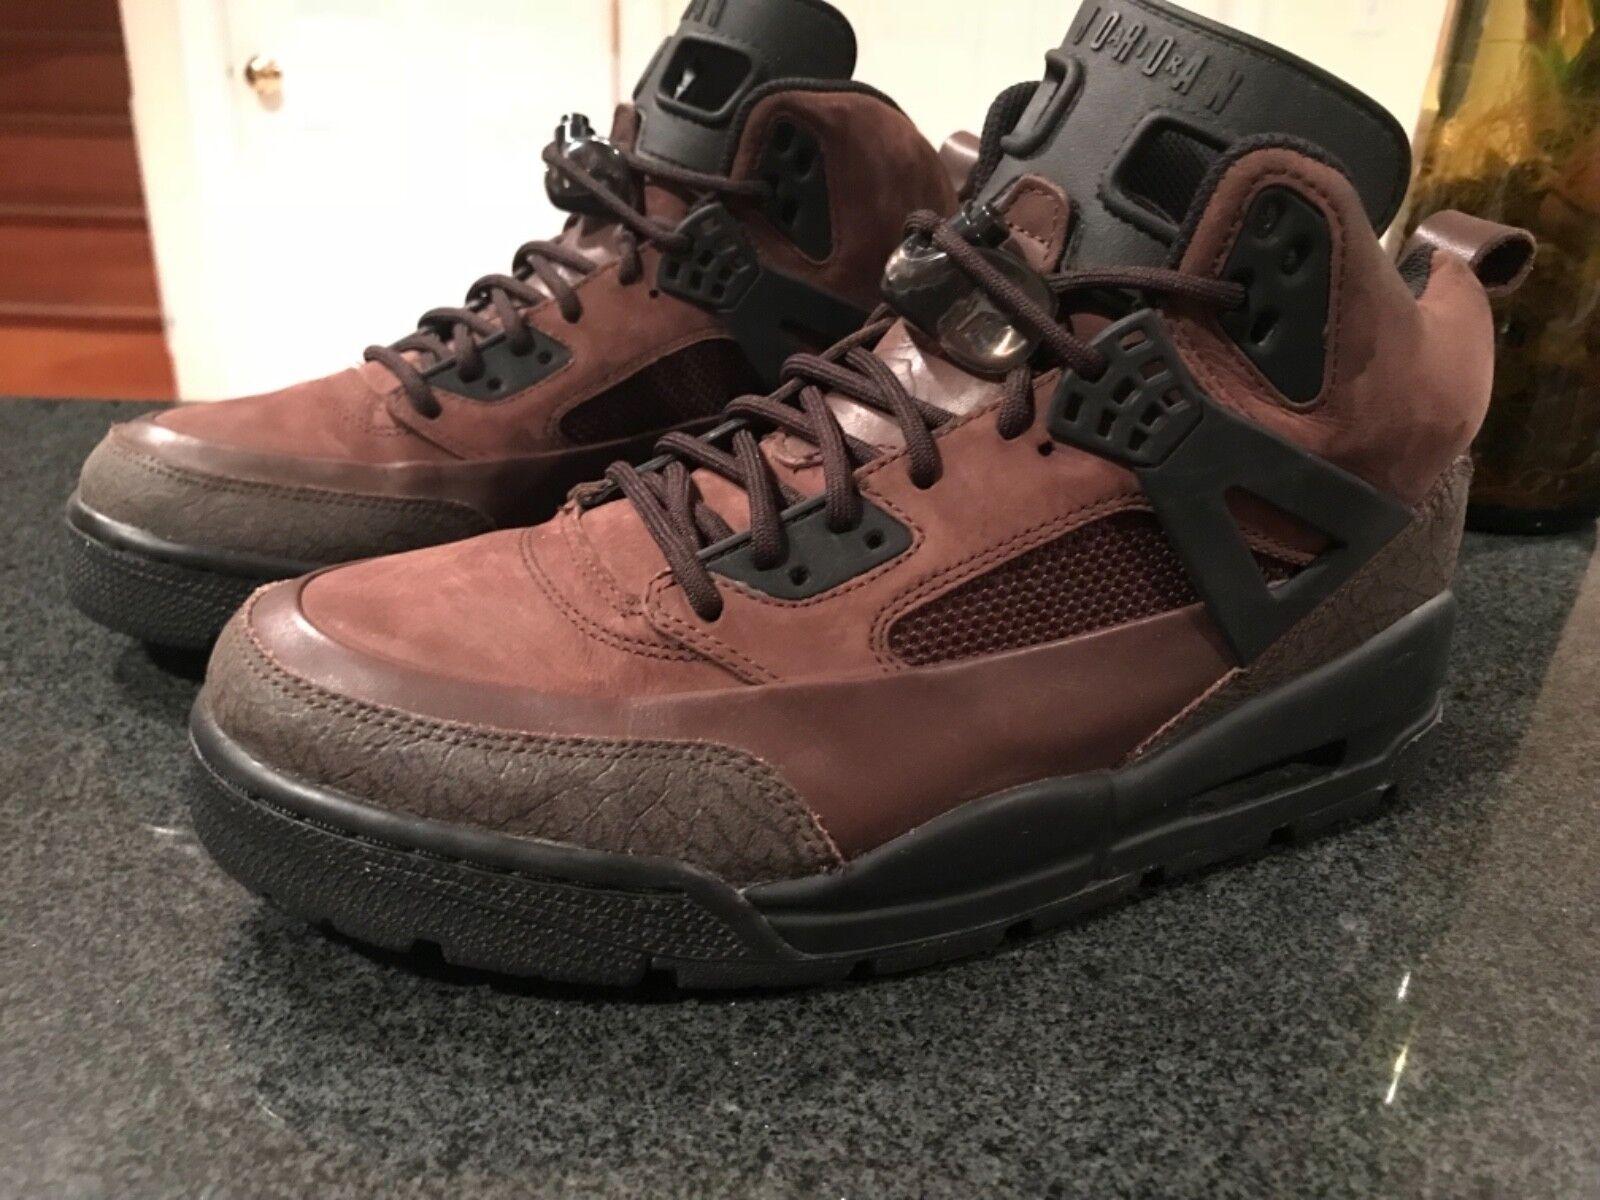 Rare Retro Jordan Winterized Spizike Size 9.5 Brown Black 2018 release boot